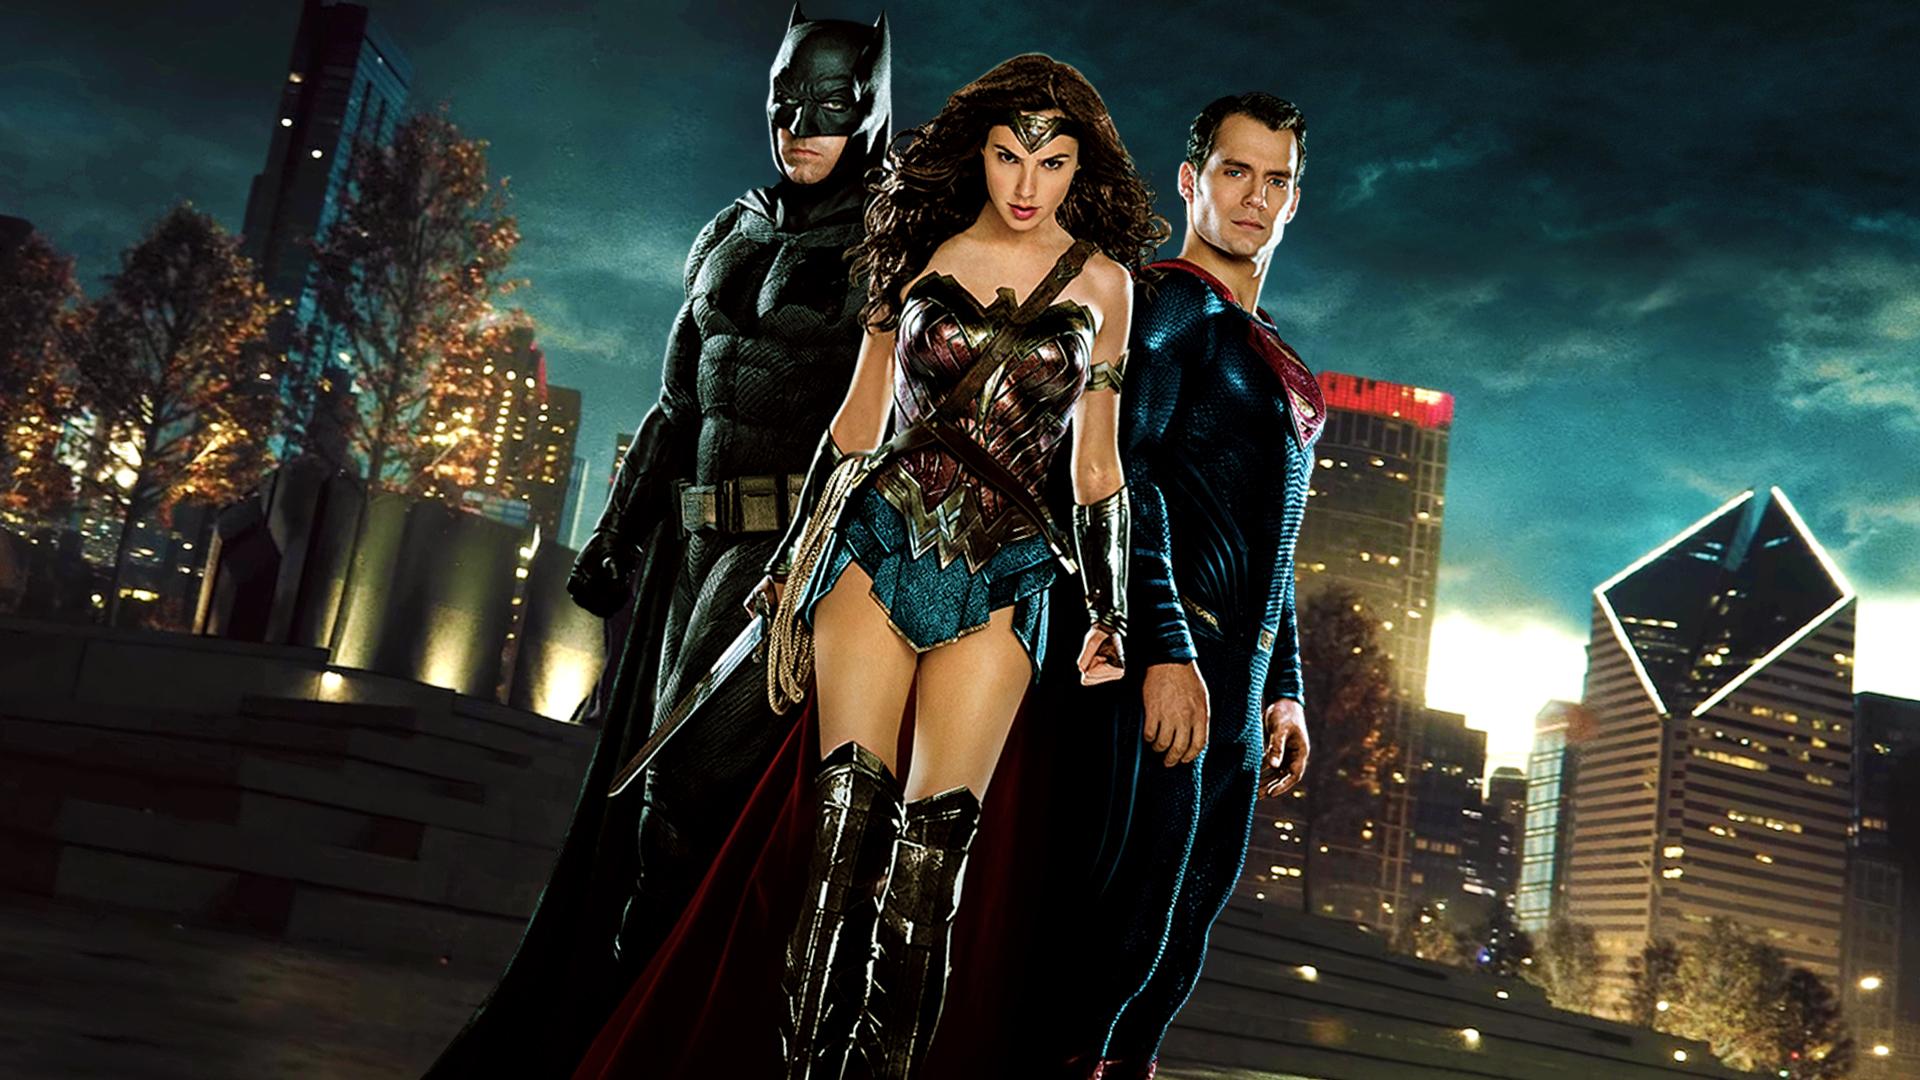 Fondos De Batman V Superman El Amanecer De La Justicia